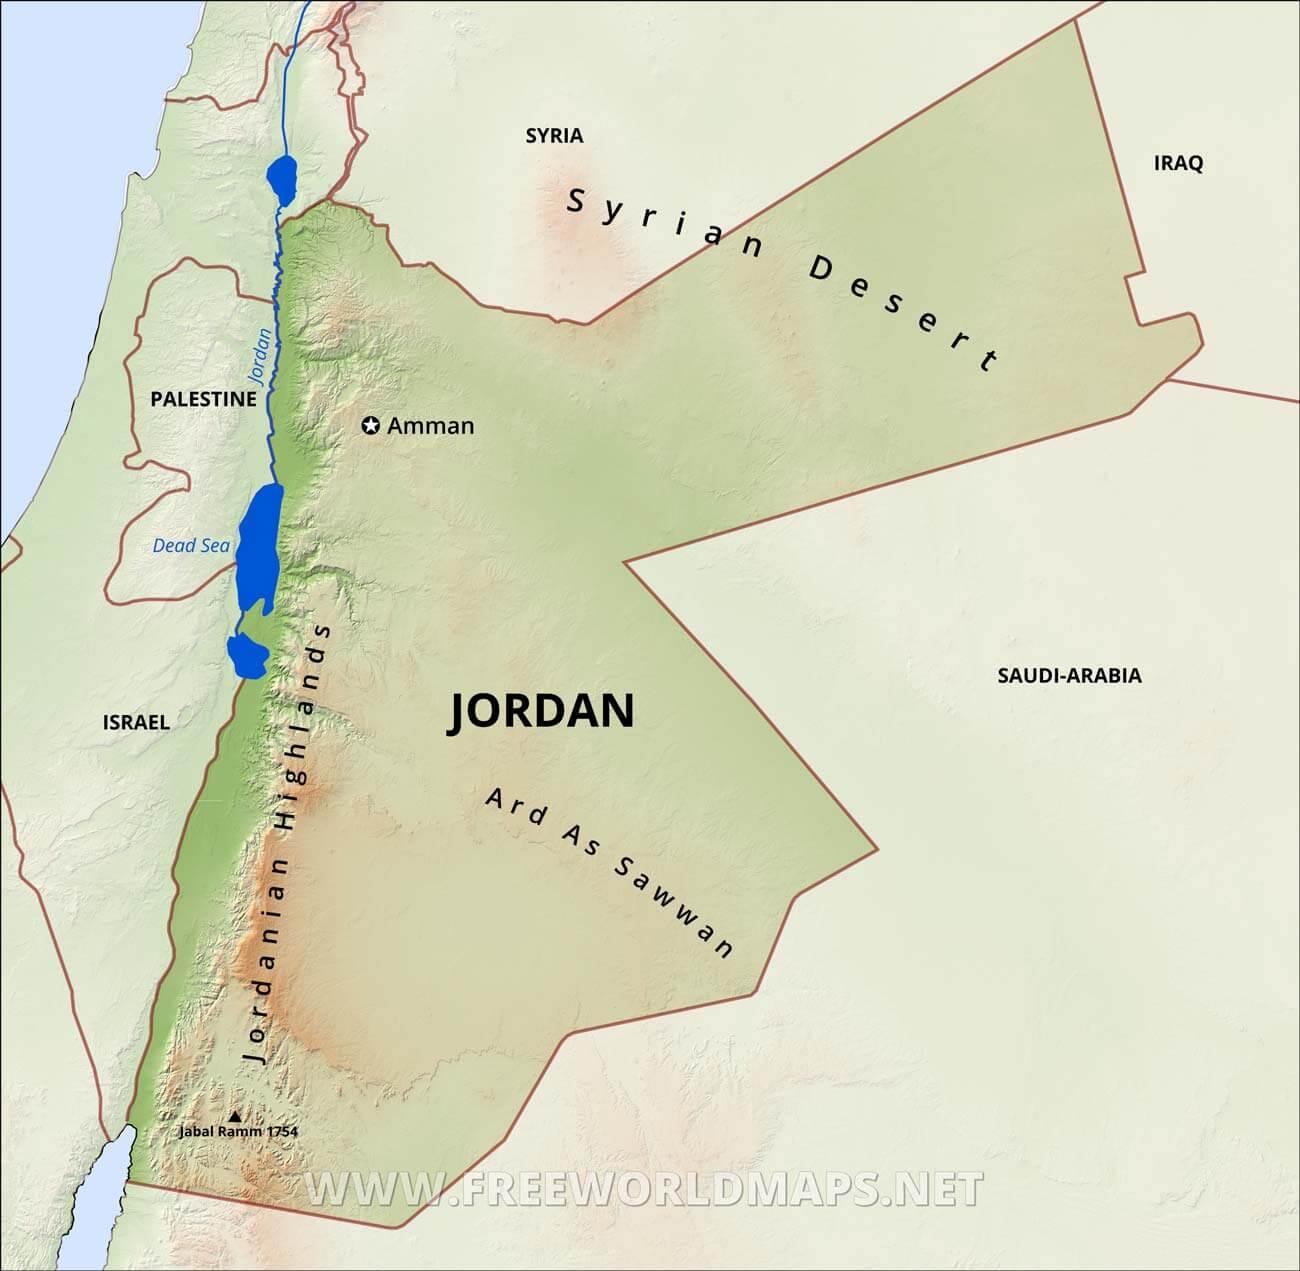 Jordan Physical Map on jordan asia, jordan and israel map, north korea map, middle east map, liberia map, jordan religion map, jordan middle east, jordan river utah map, jordan capital on map, jordan river valley map, jordan location on world map, jordan river on map,